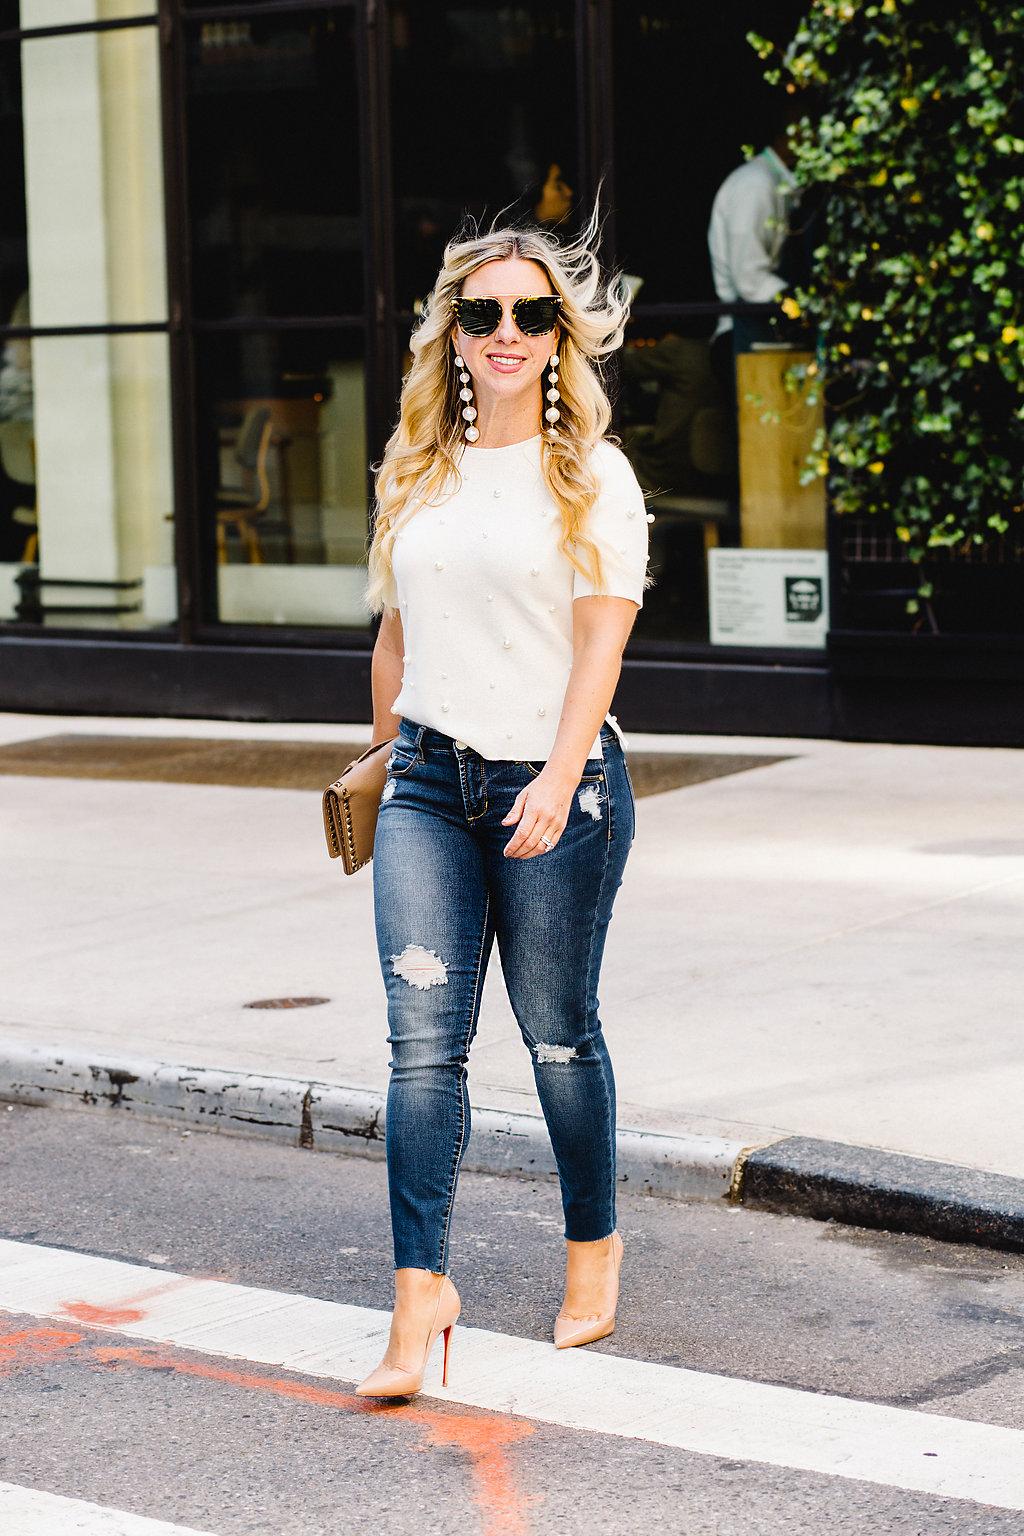 Pearl Embellished Top | The Darling Petite Diva | Fashion Week